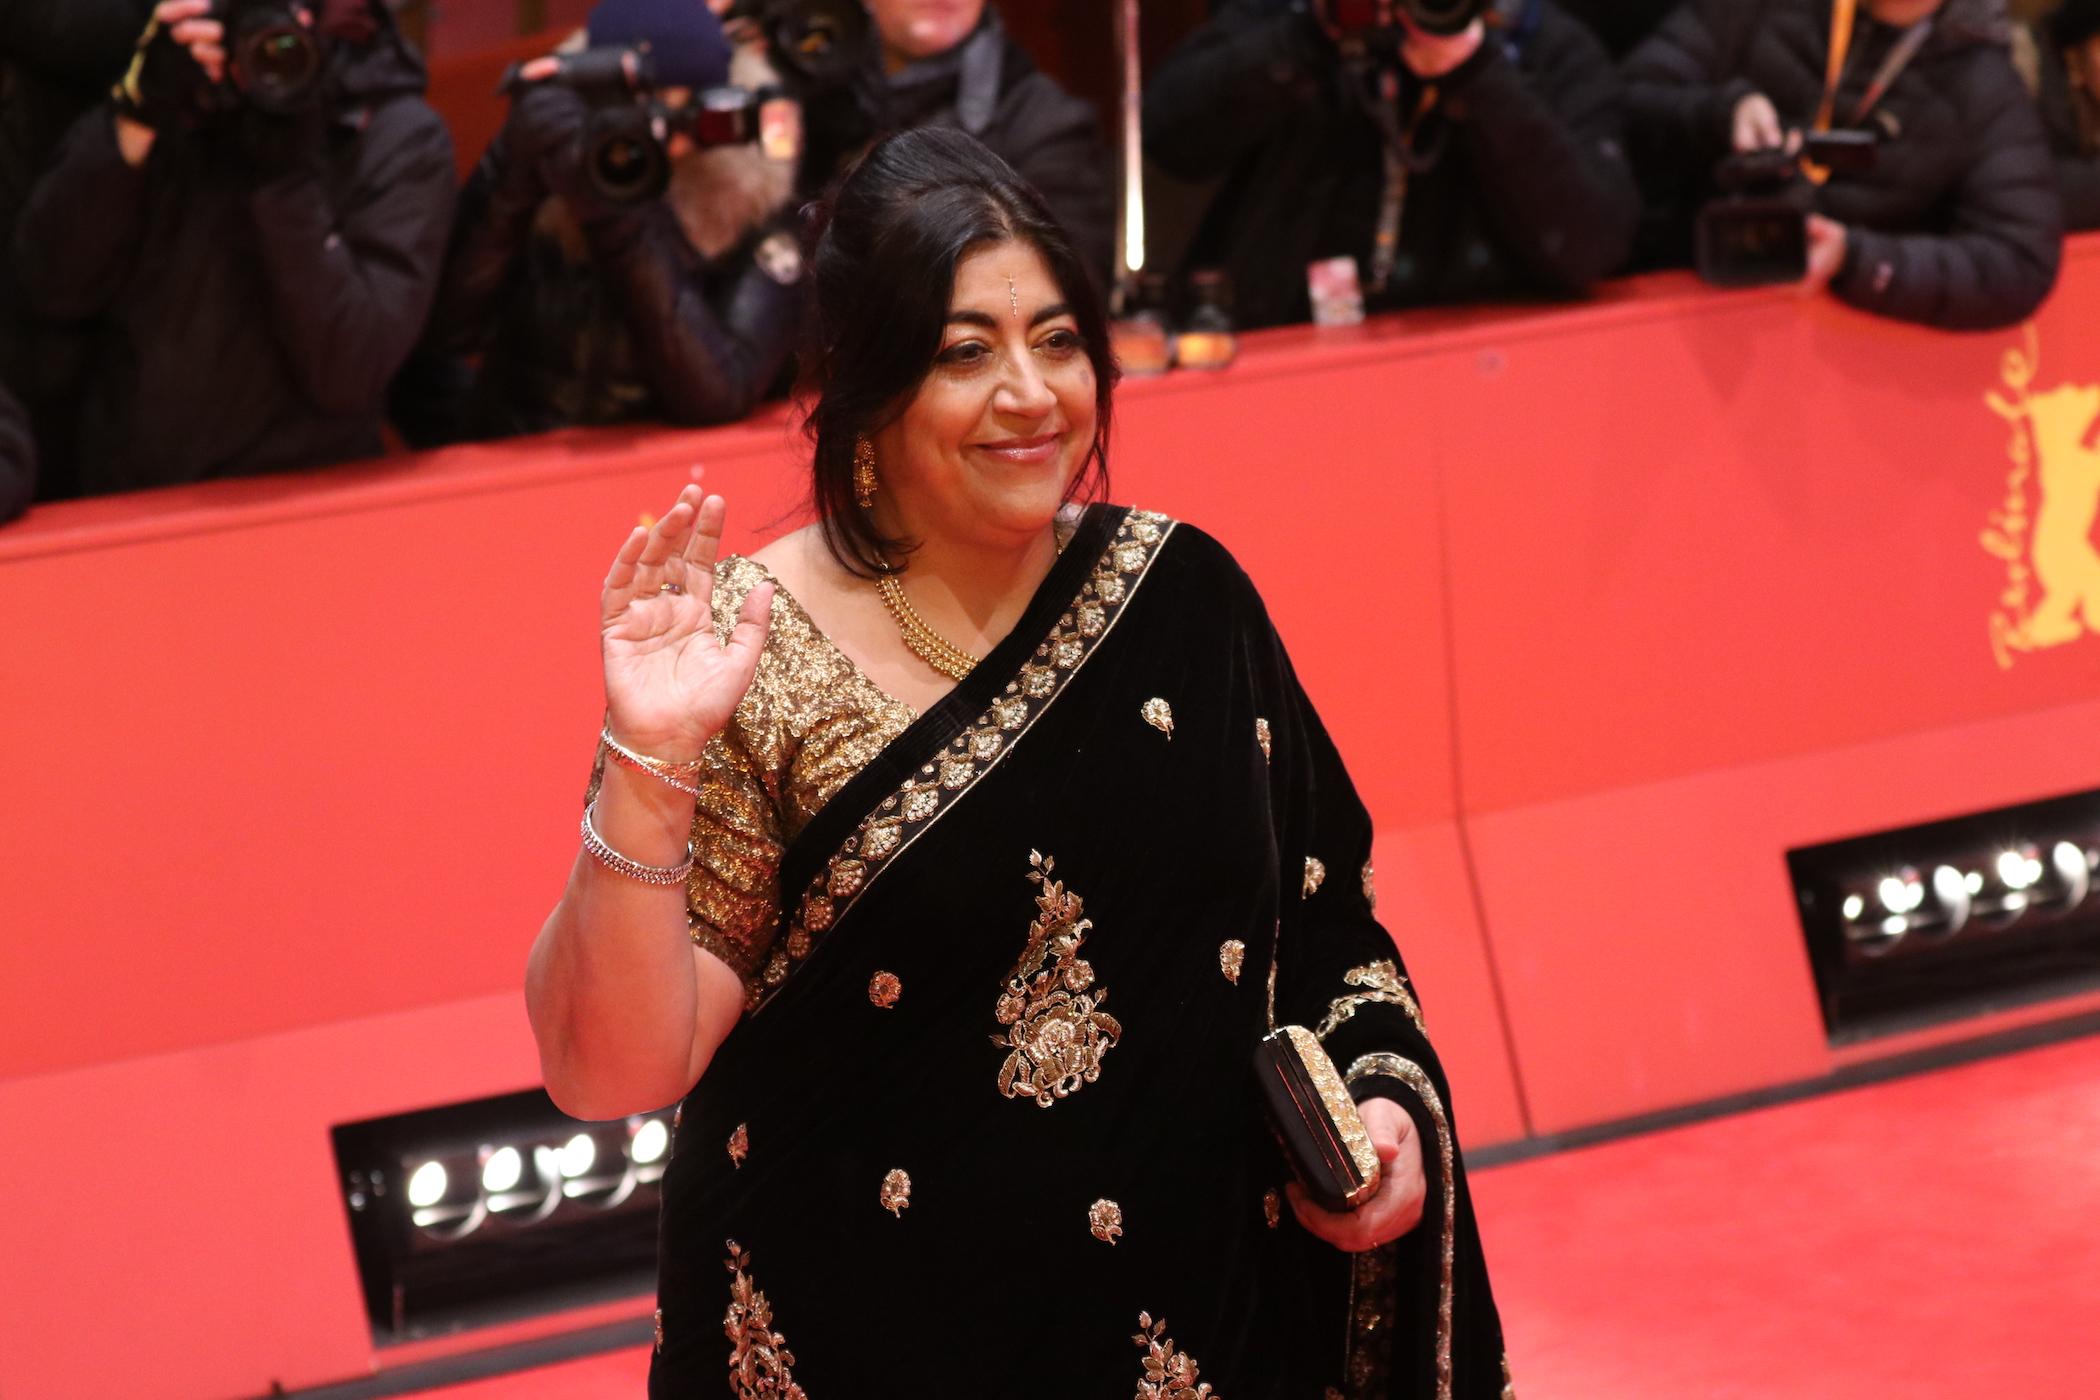 Berlino 2017: la regista Gurinder Chadha sul red carpet  di Viceroy's House